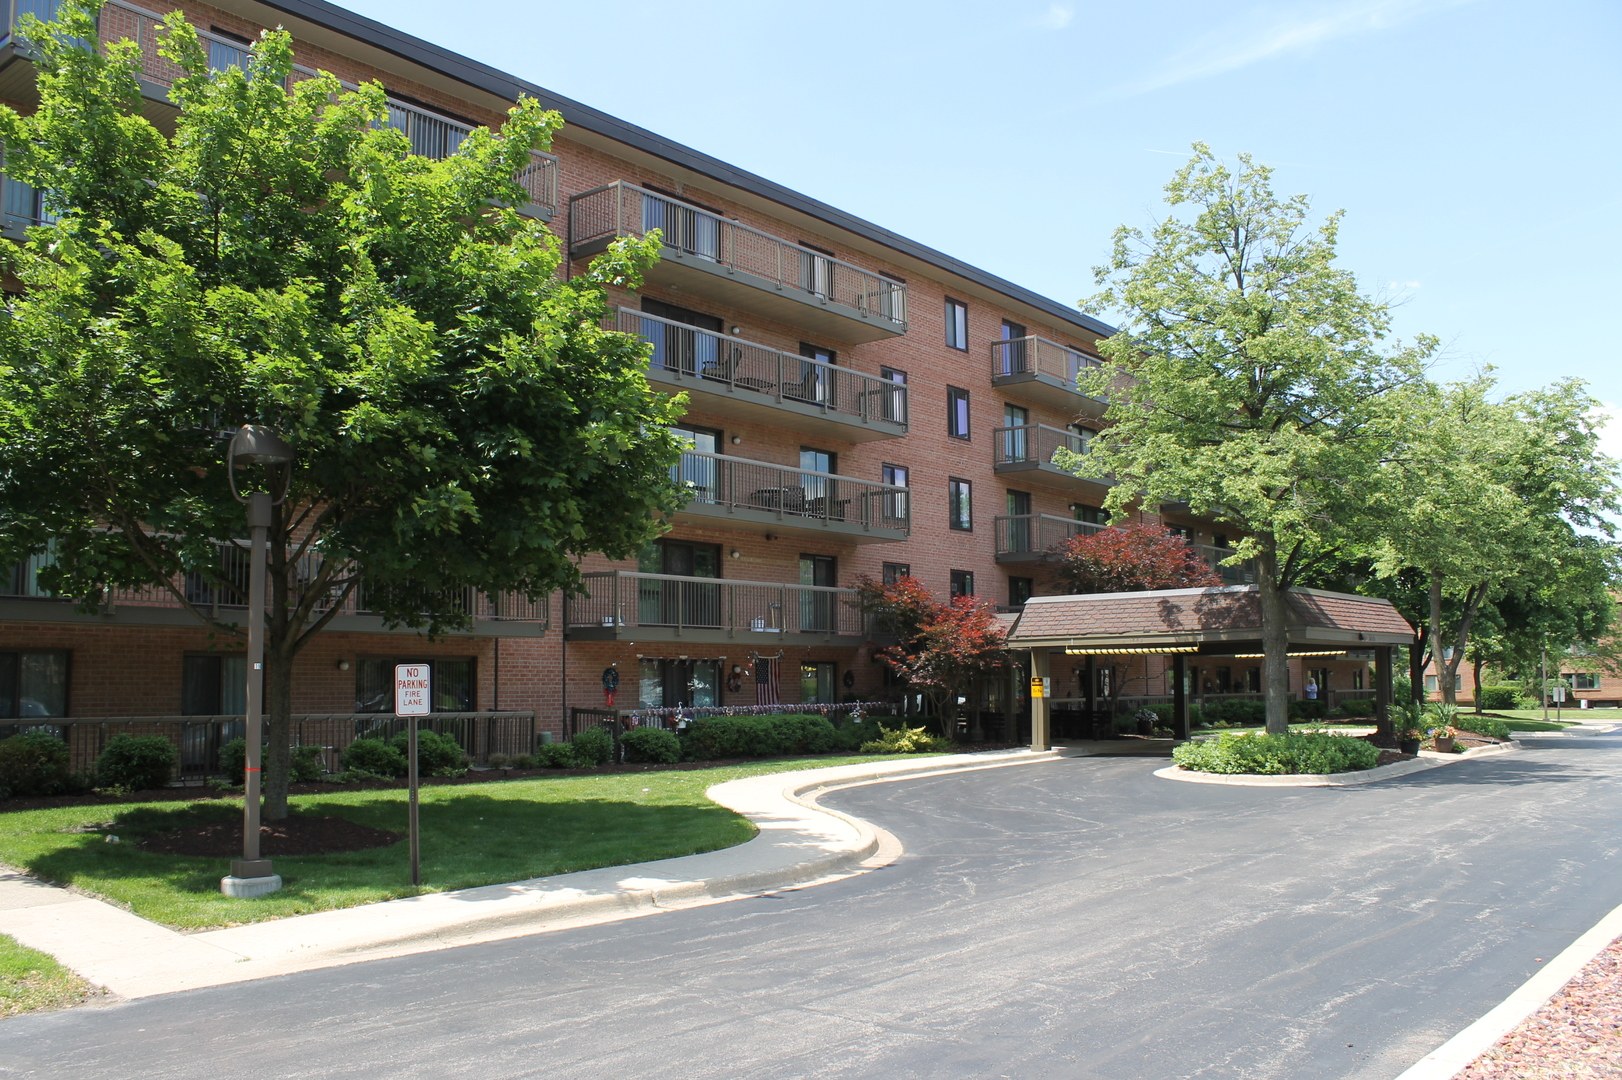 6443 Clarendon Hills Unit Unit 110 ,Willowbrook, Illinois 60527